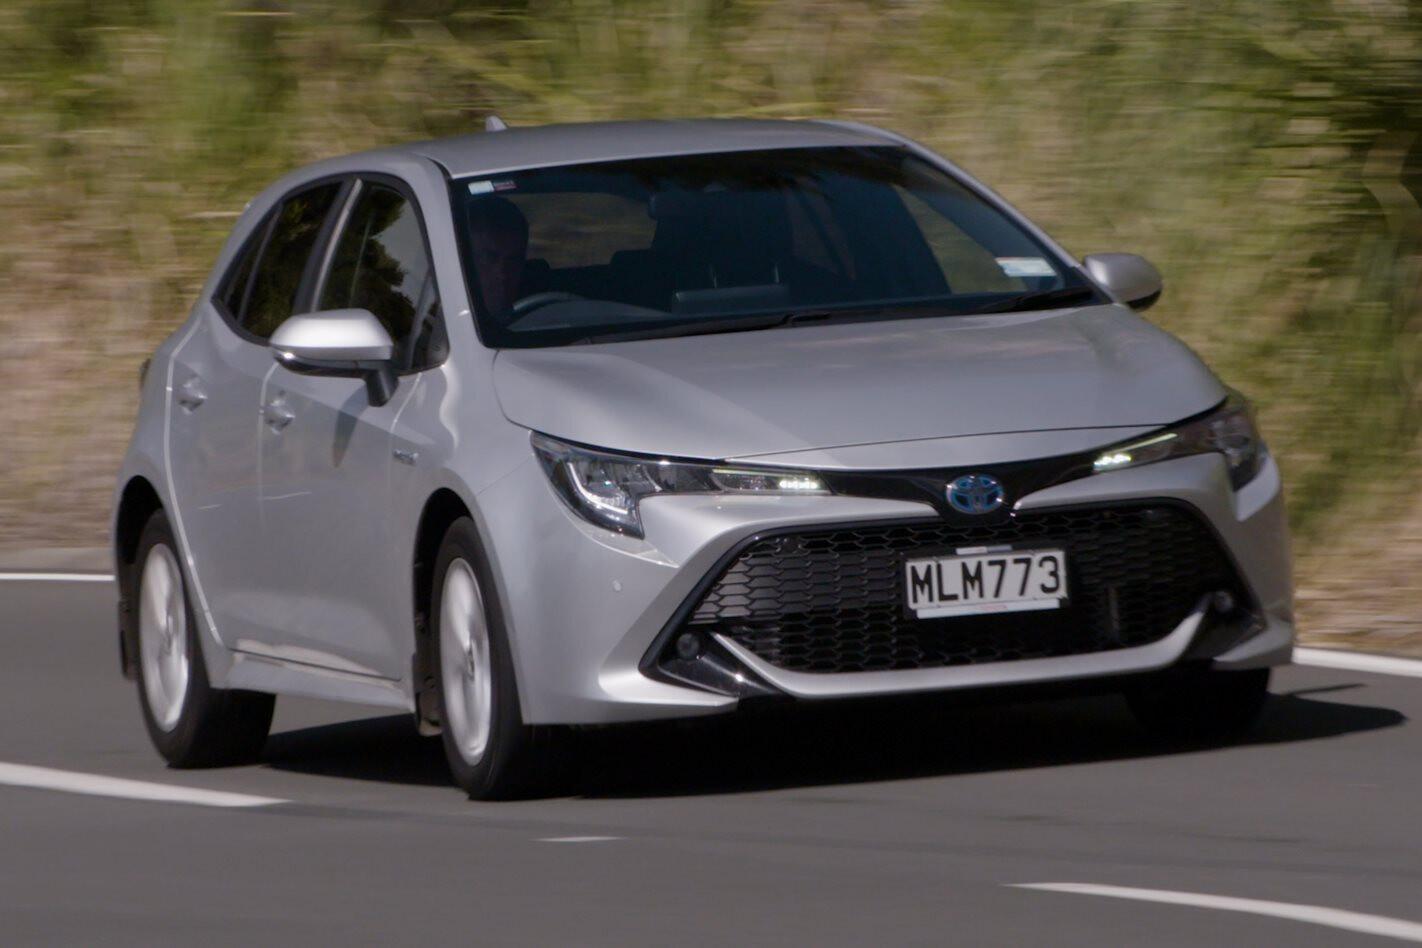 2020 Toyota Corolla SX Hybrid review